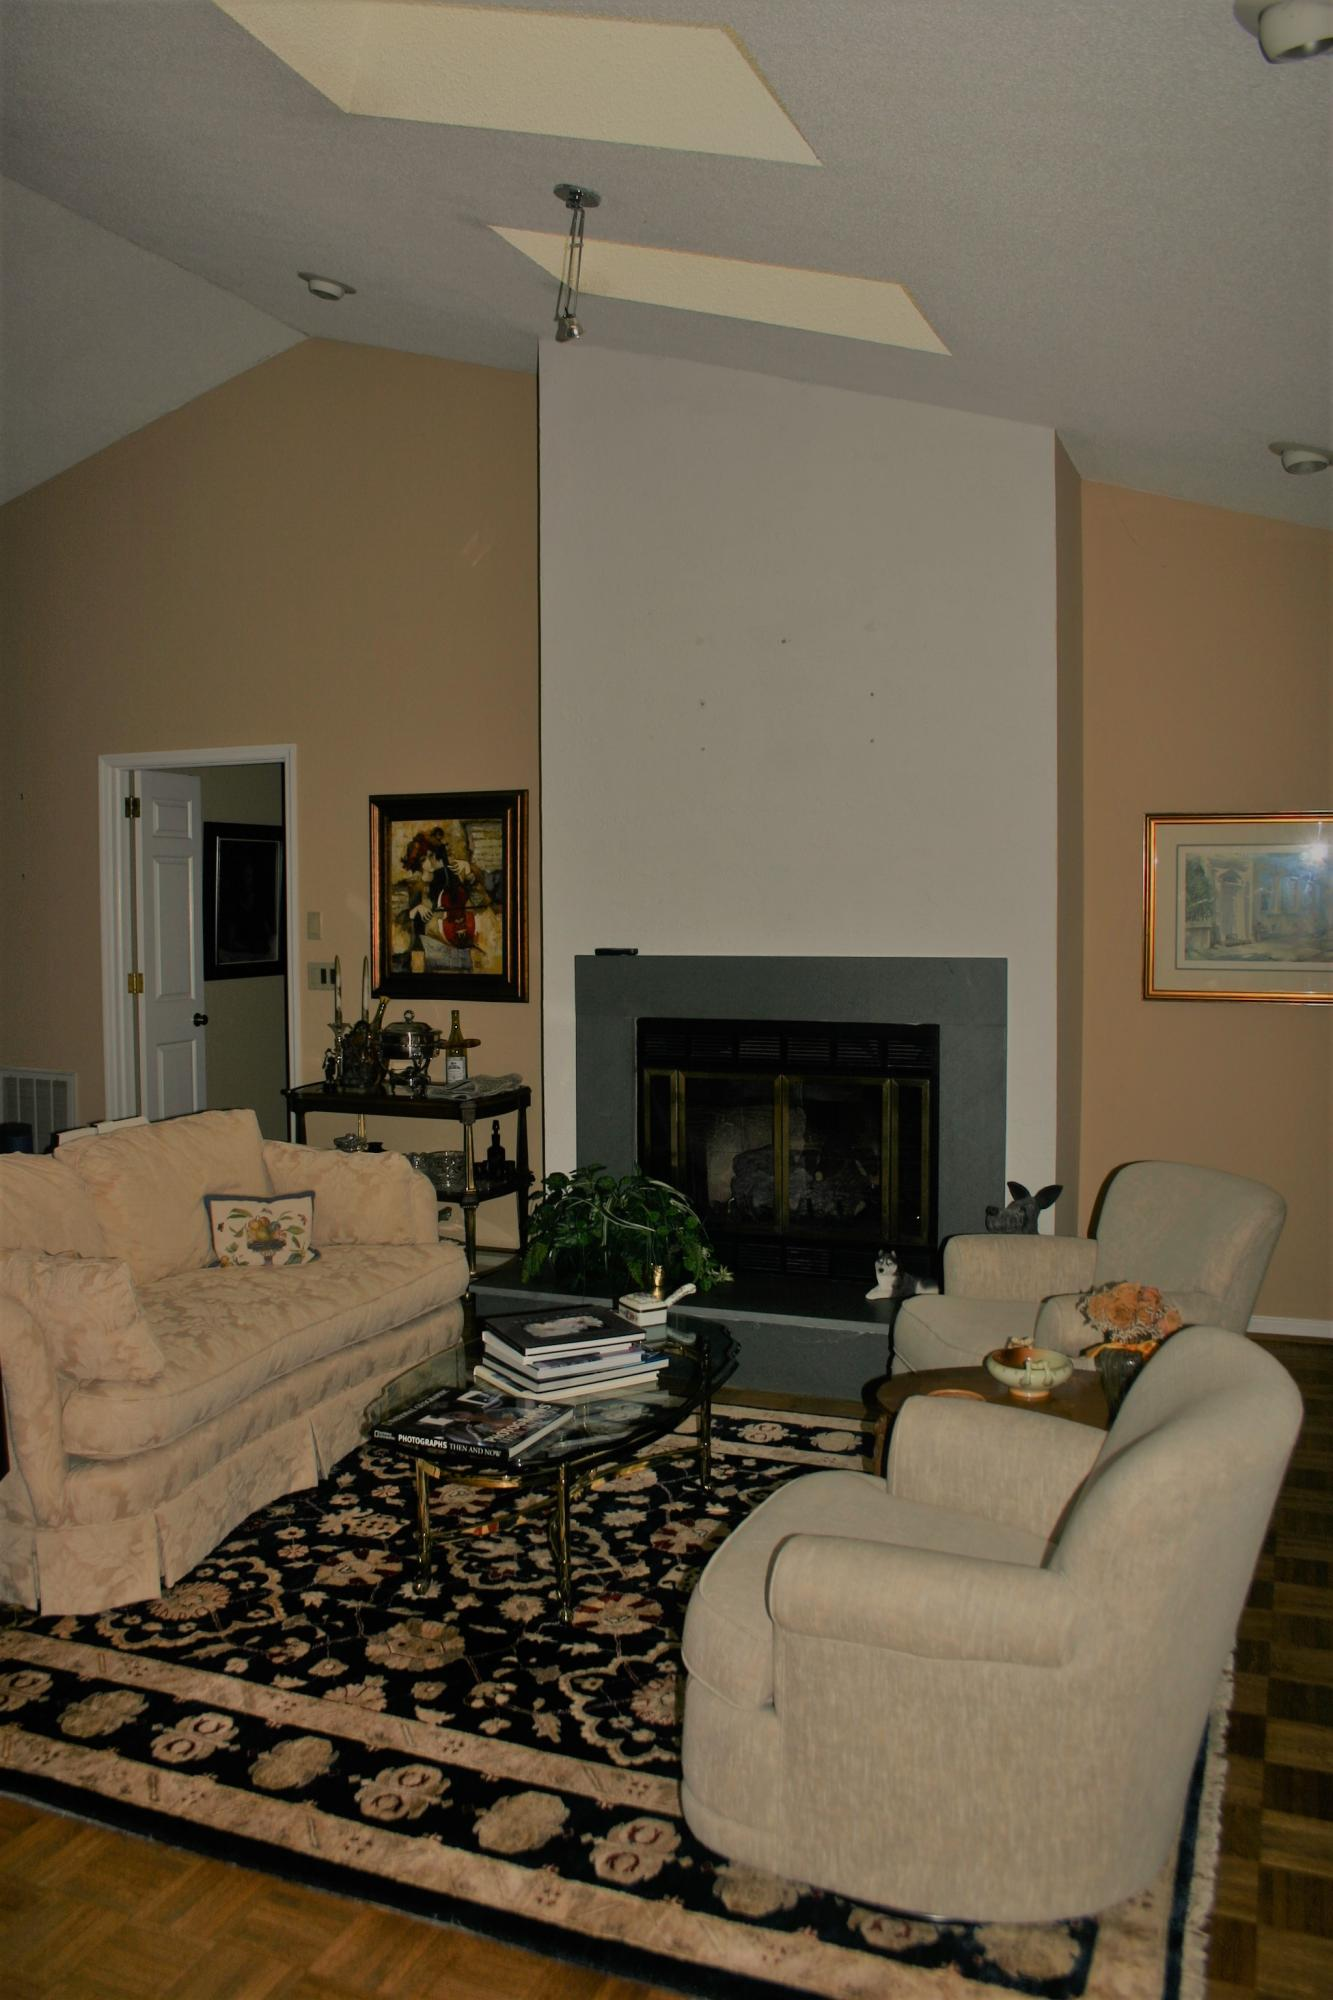 Snee Farm Homes For Sale - 935 Overview, Mount Pleasant, SC - 32